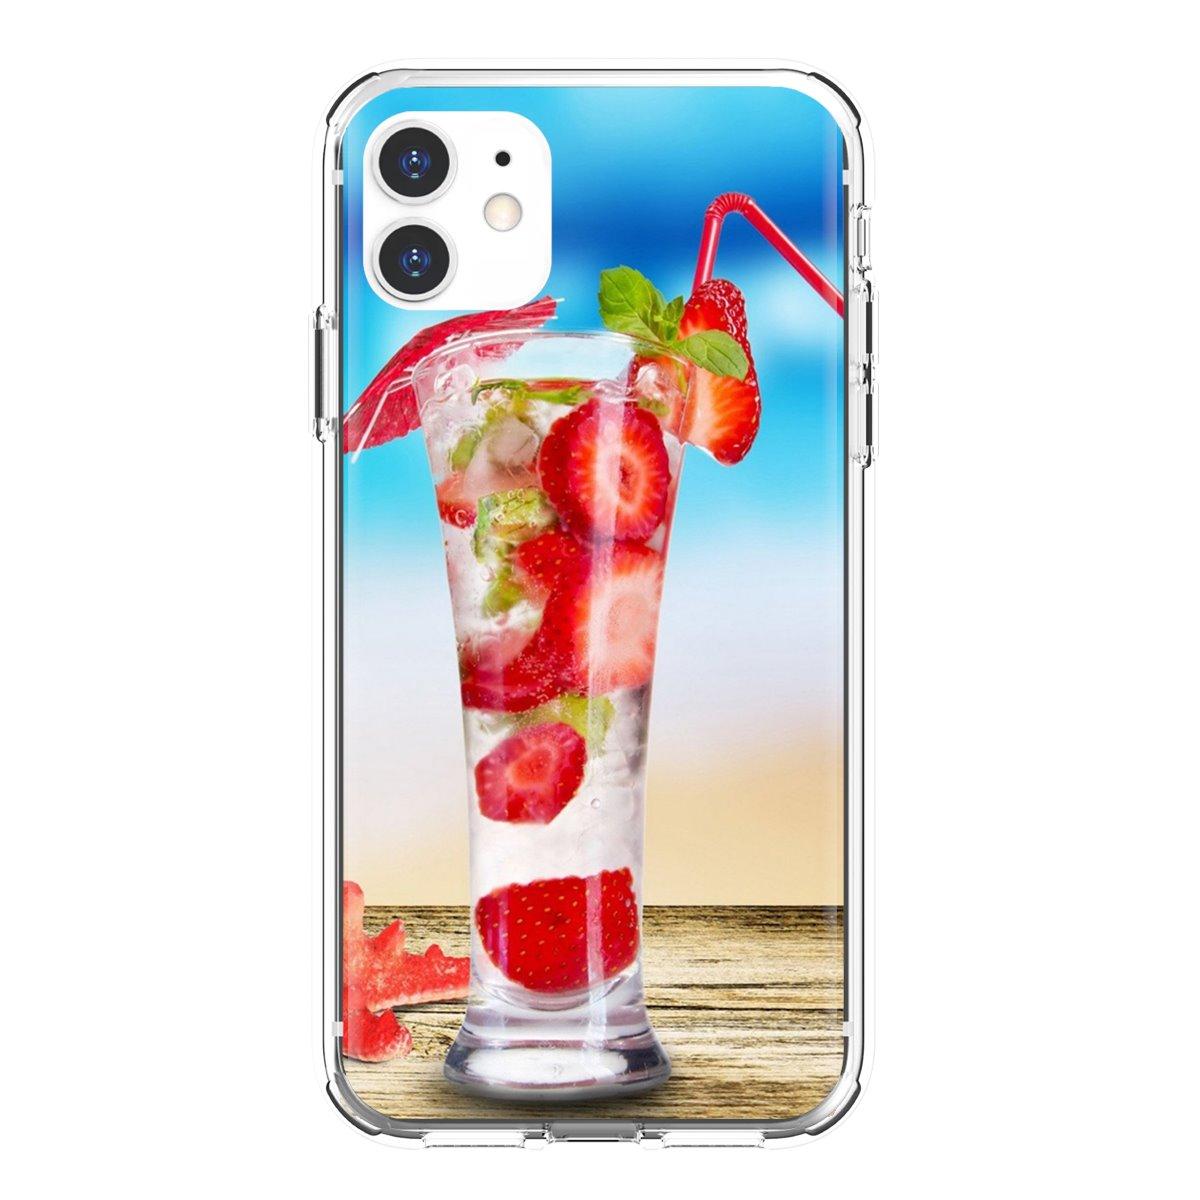 Food Drink Wallpaper Beautiful Silicone Phone Case For Samsung Galaxy J1 J2 J3 J4 J5 J6